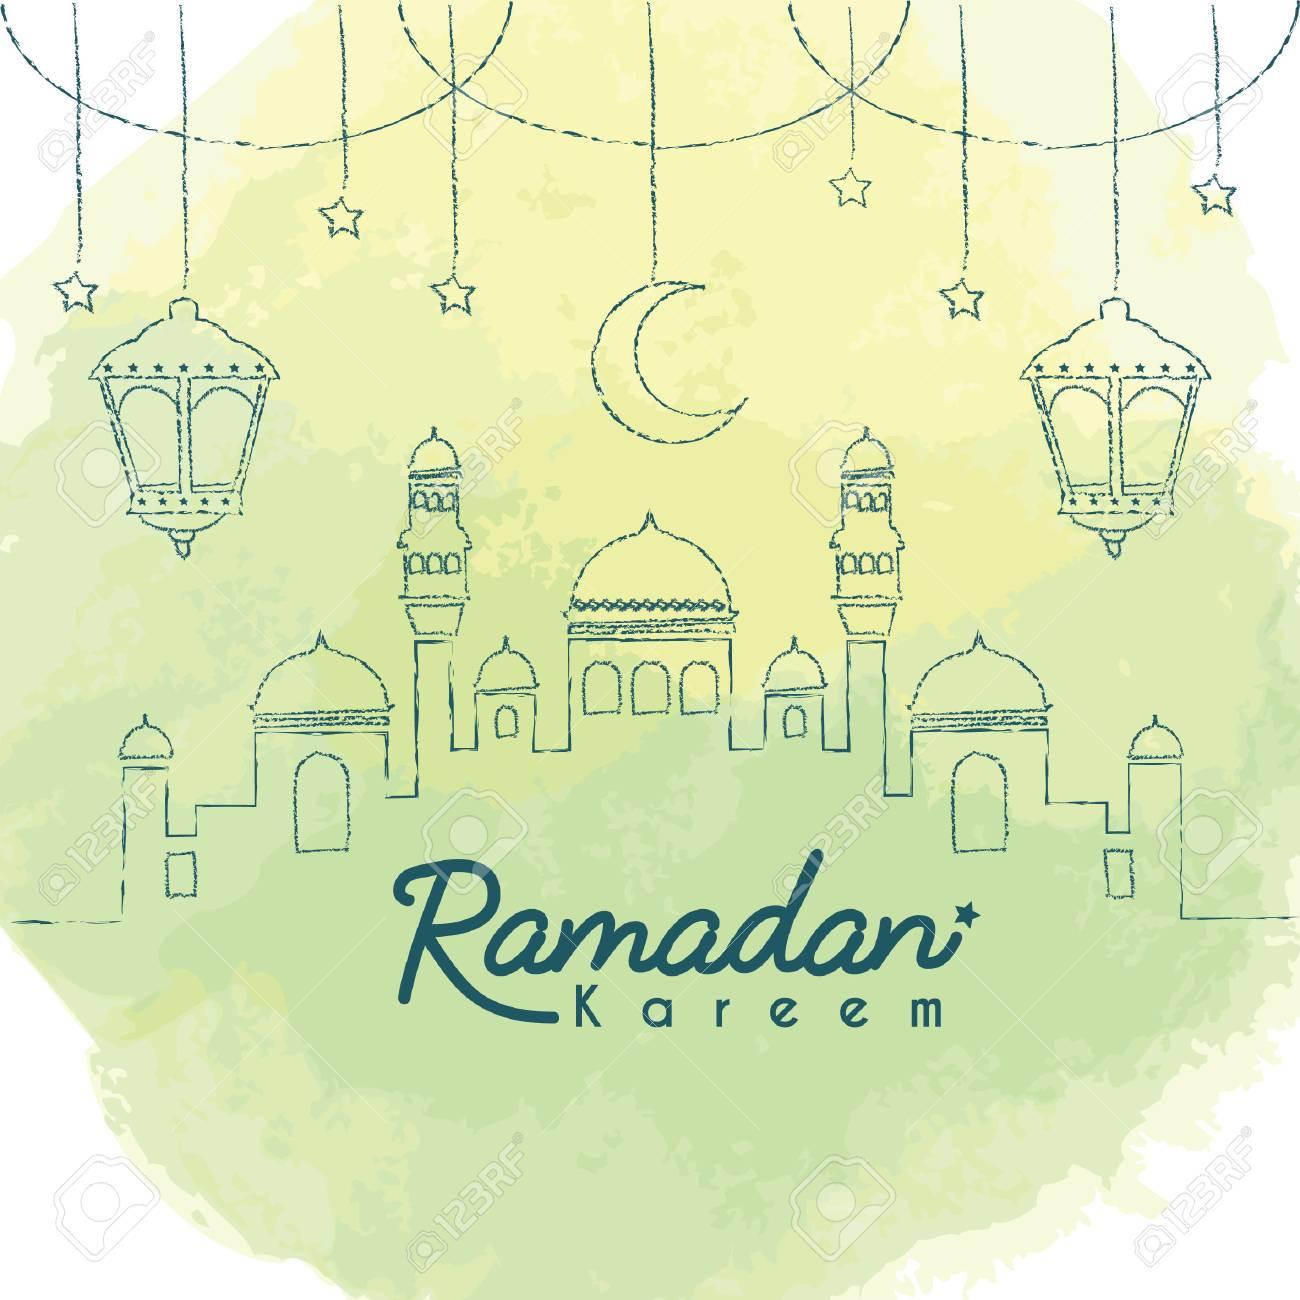 Ramadan Kareem template  Hand drawn mosque with crescent moon